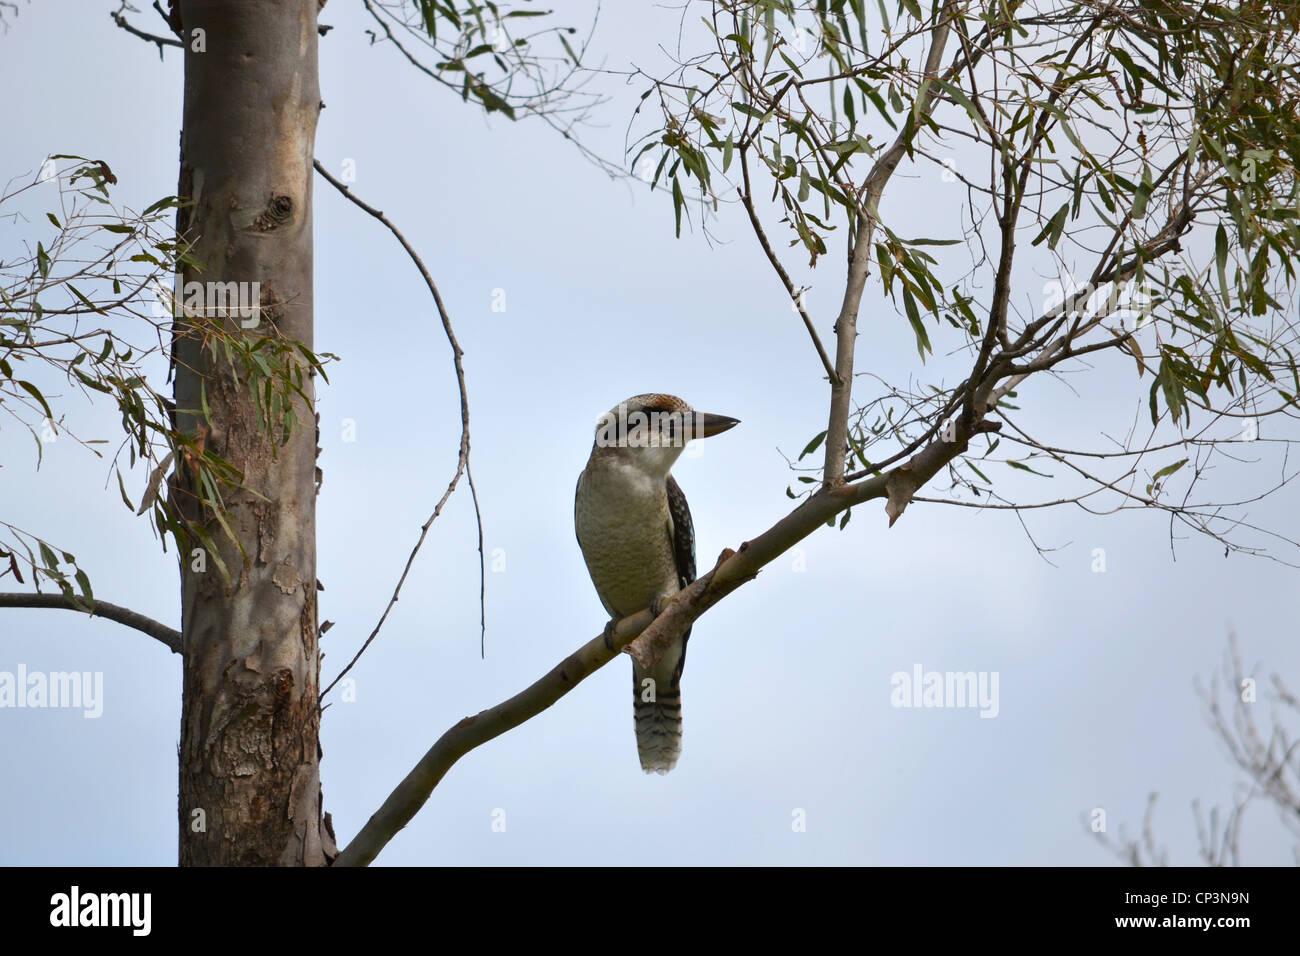 Kookaburra sitting in tree - Stock Image